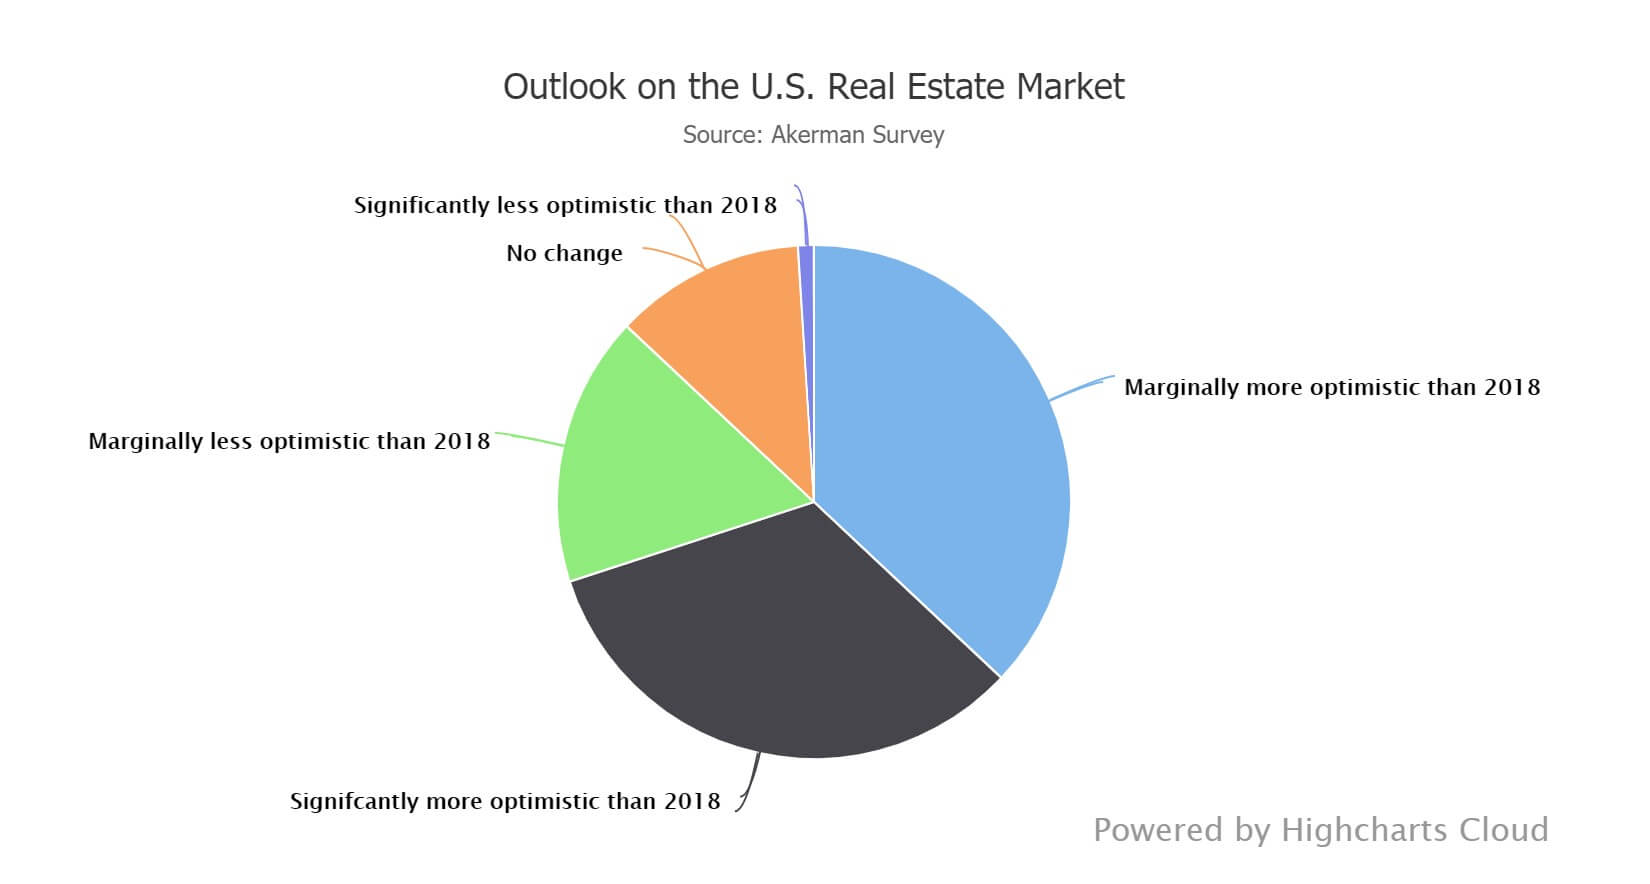 Housing market optimism among real estate executives 2019